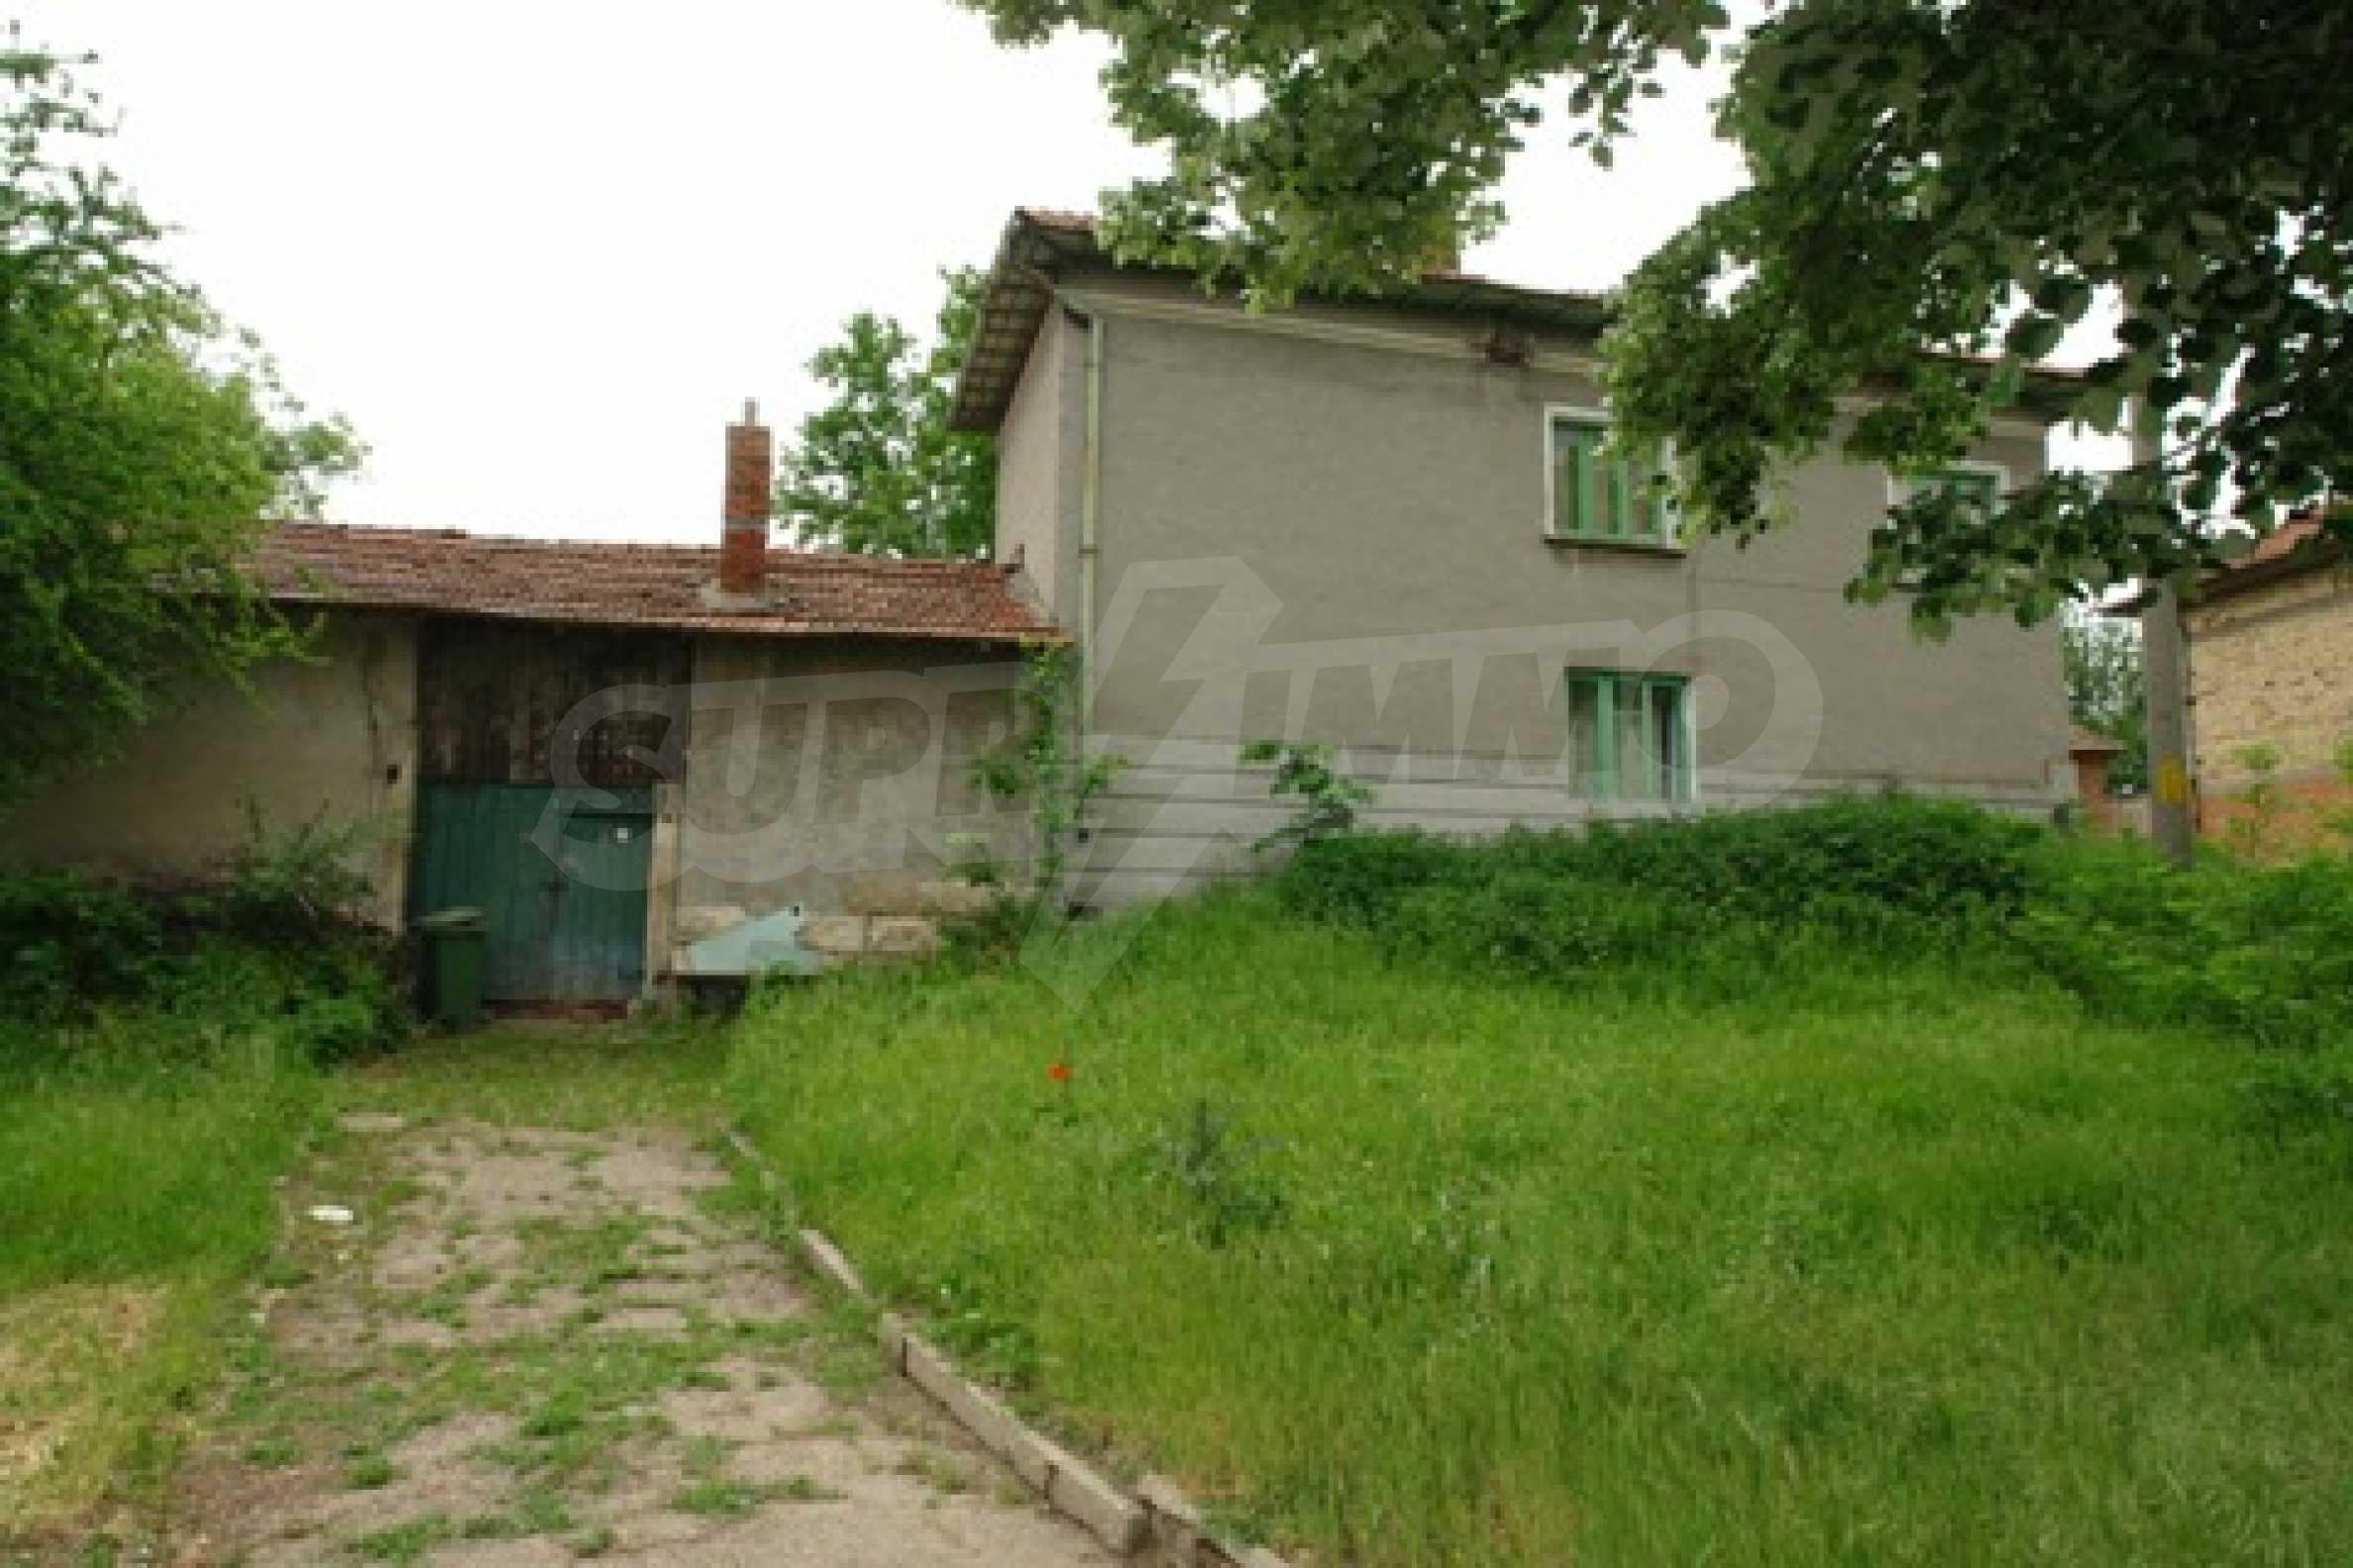 Spacious two-storey 4-bedroom house in Trastenik village, Ruse district 3